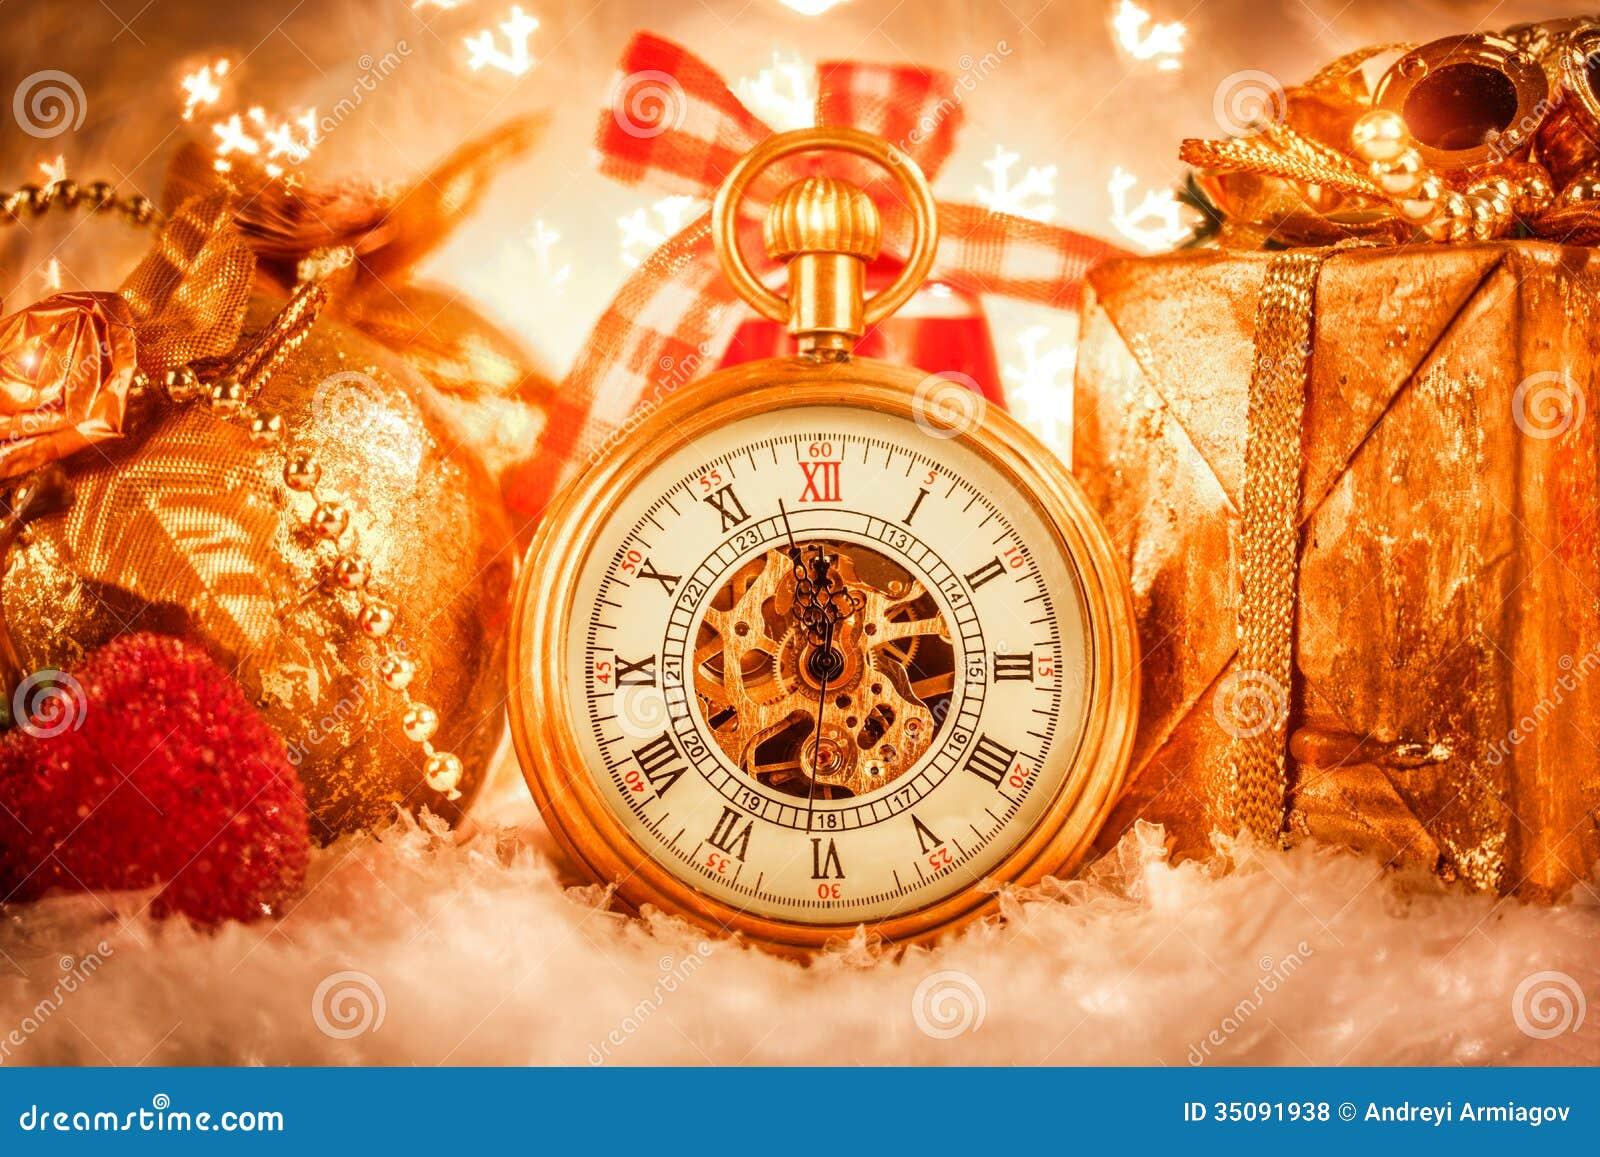 Christmas Pocket Watch Stock Photo Image Of Countdown